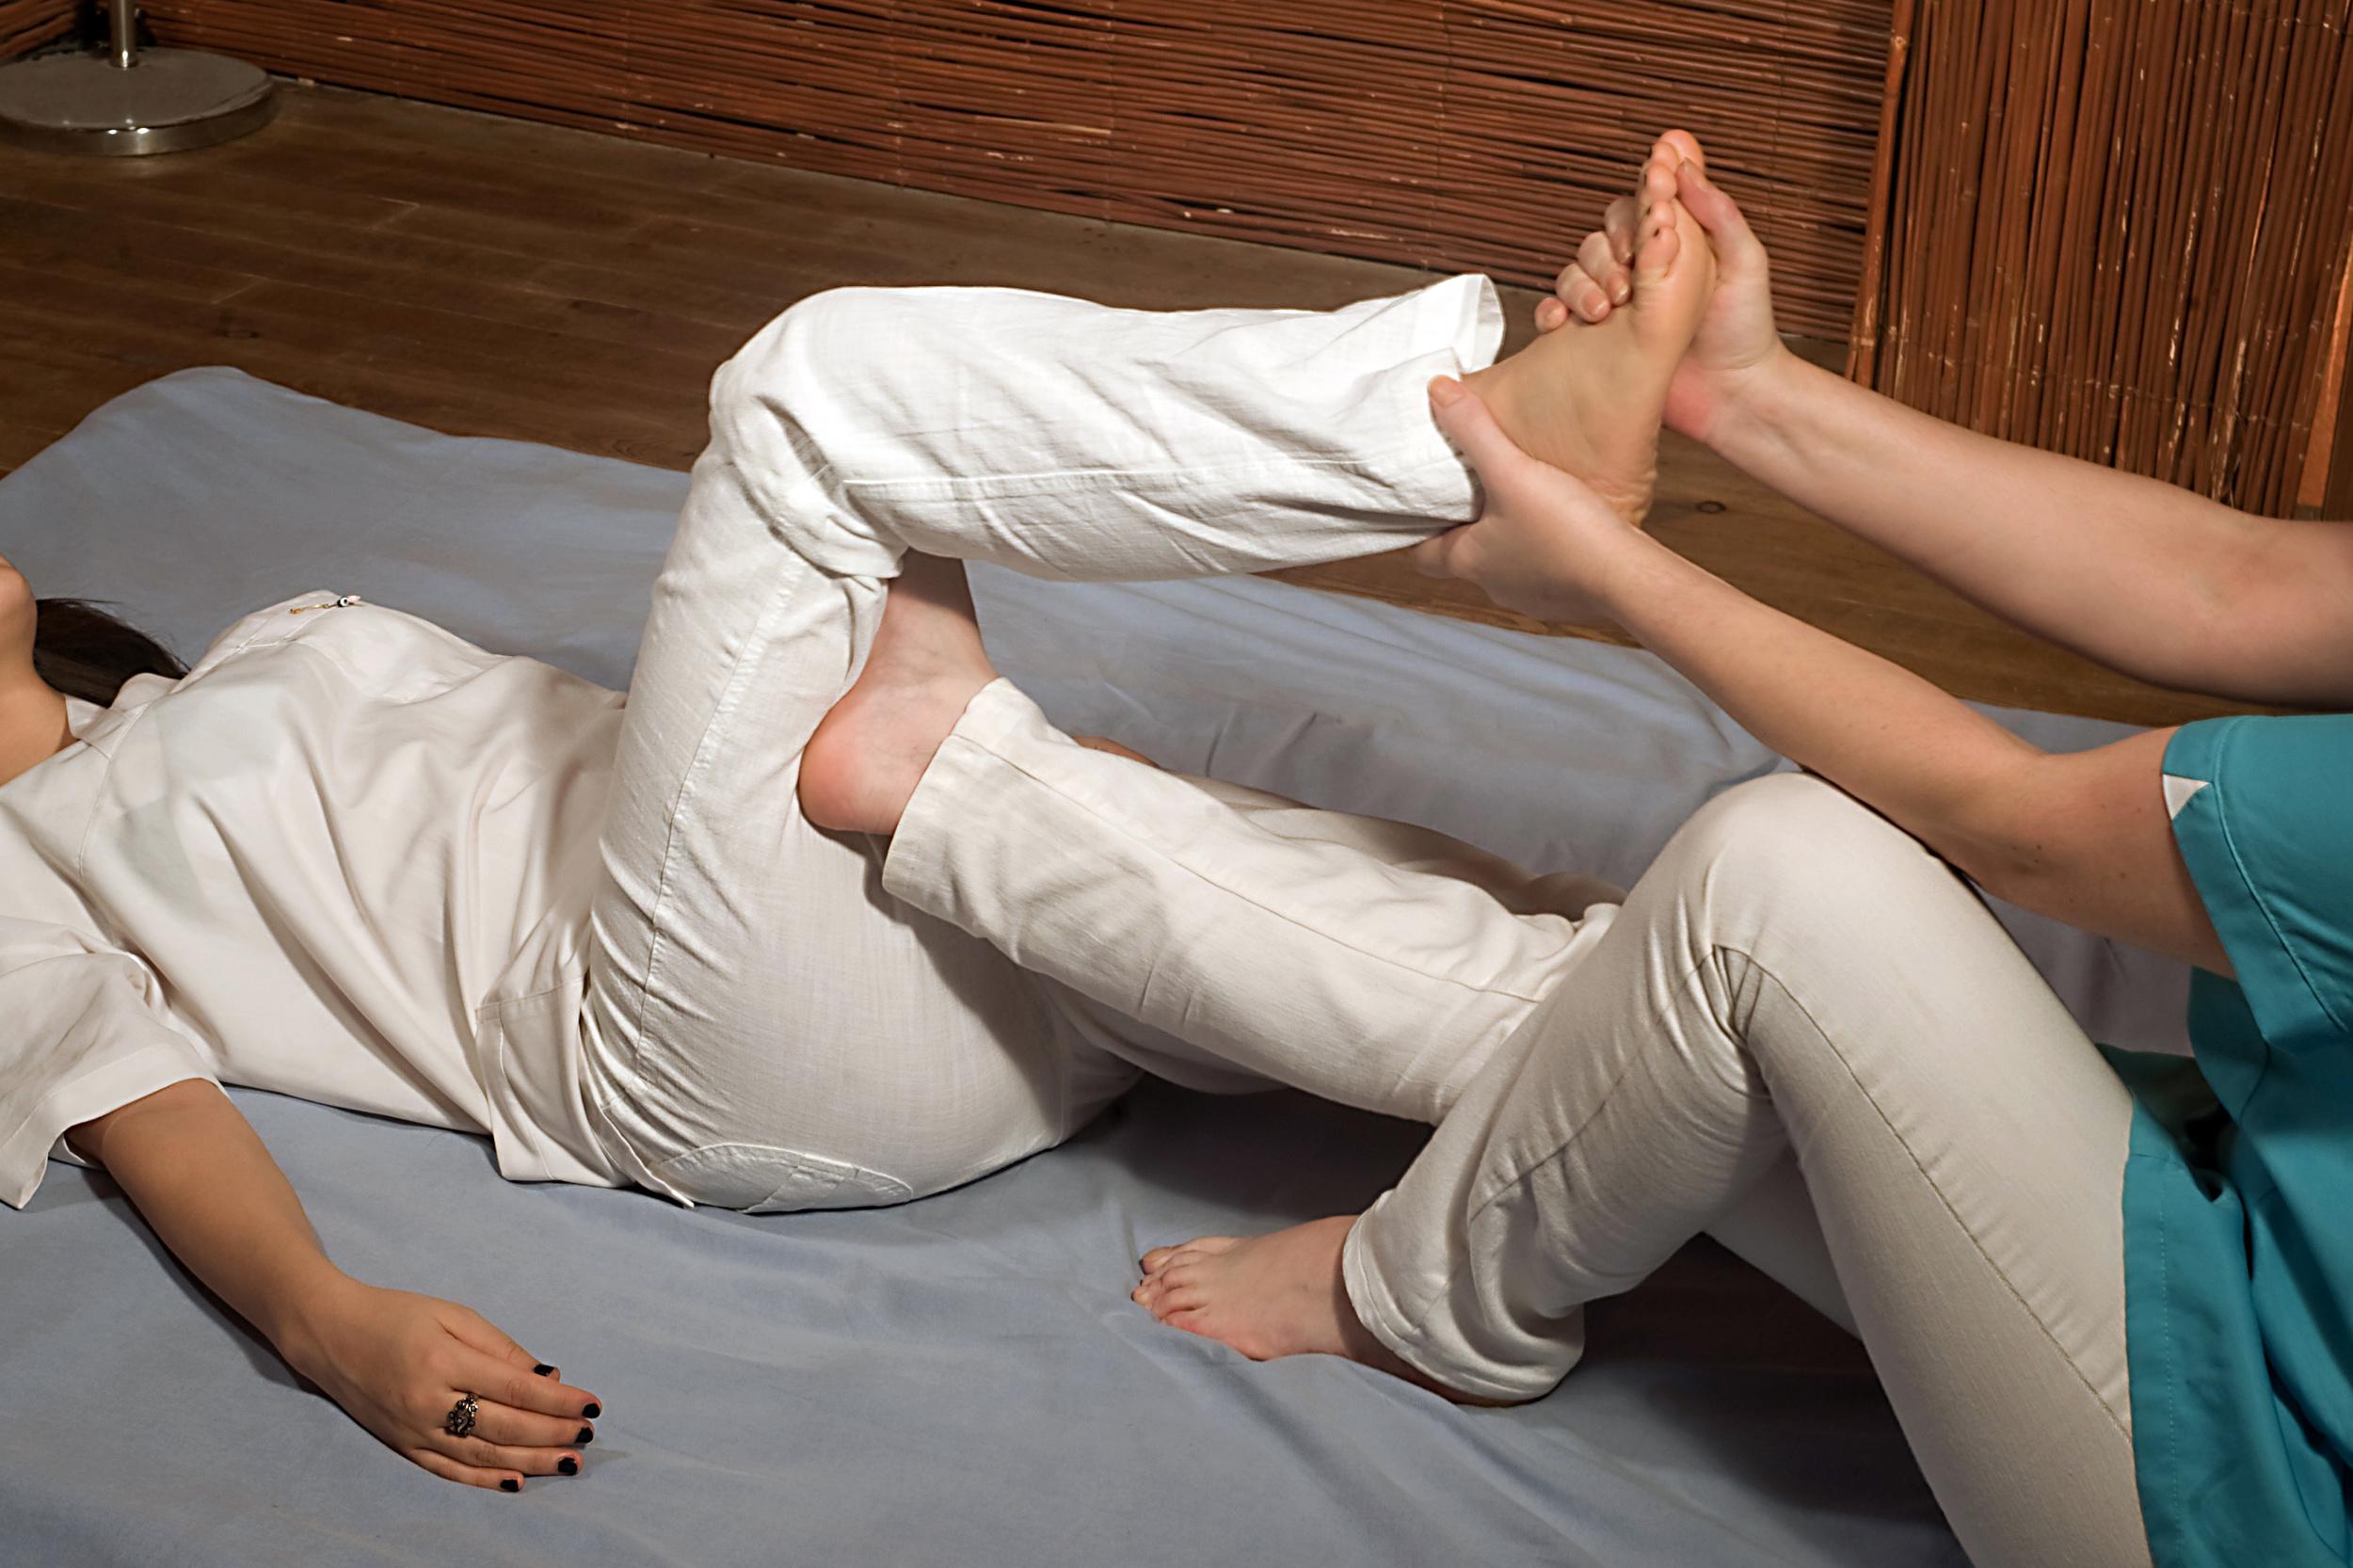 Thai-Yoga-massage-therapist-in-Longmont-Boulder.jpg